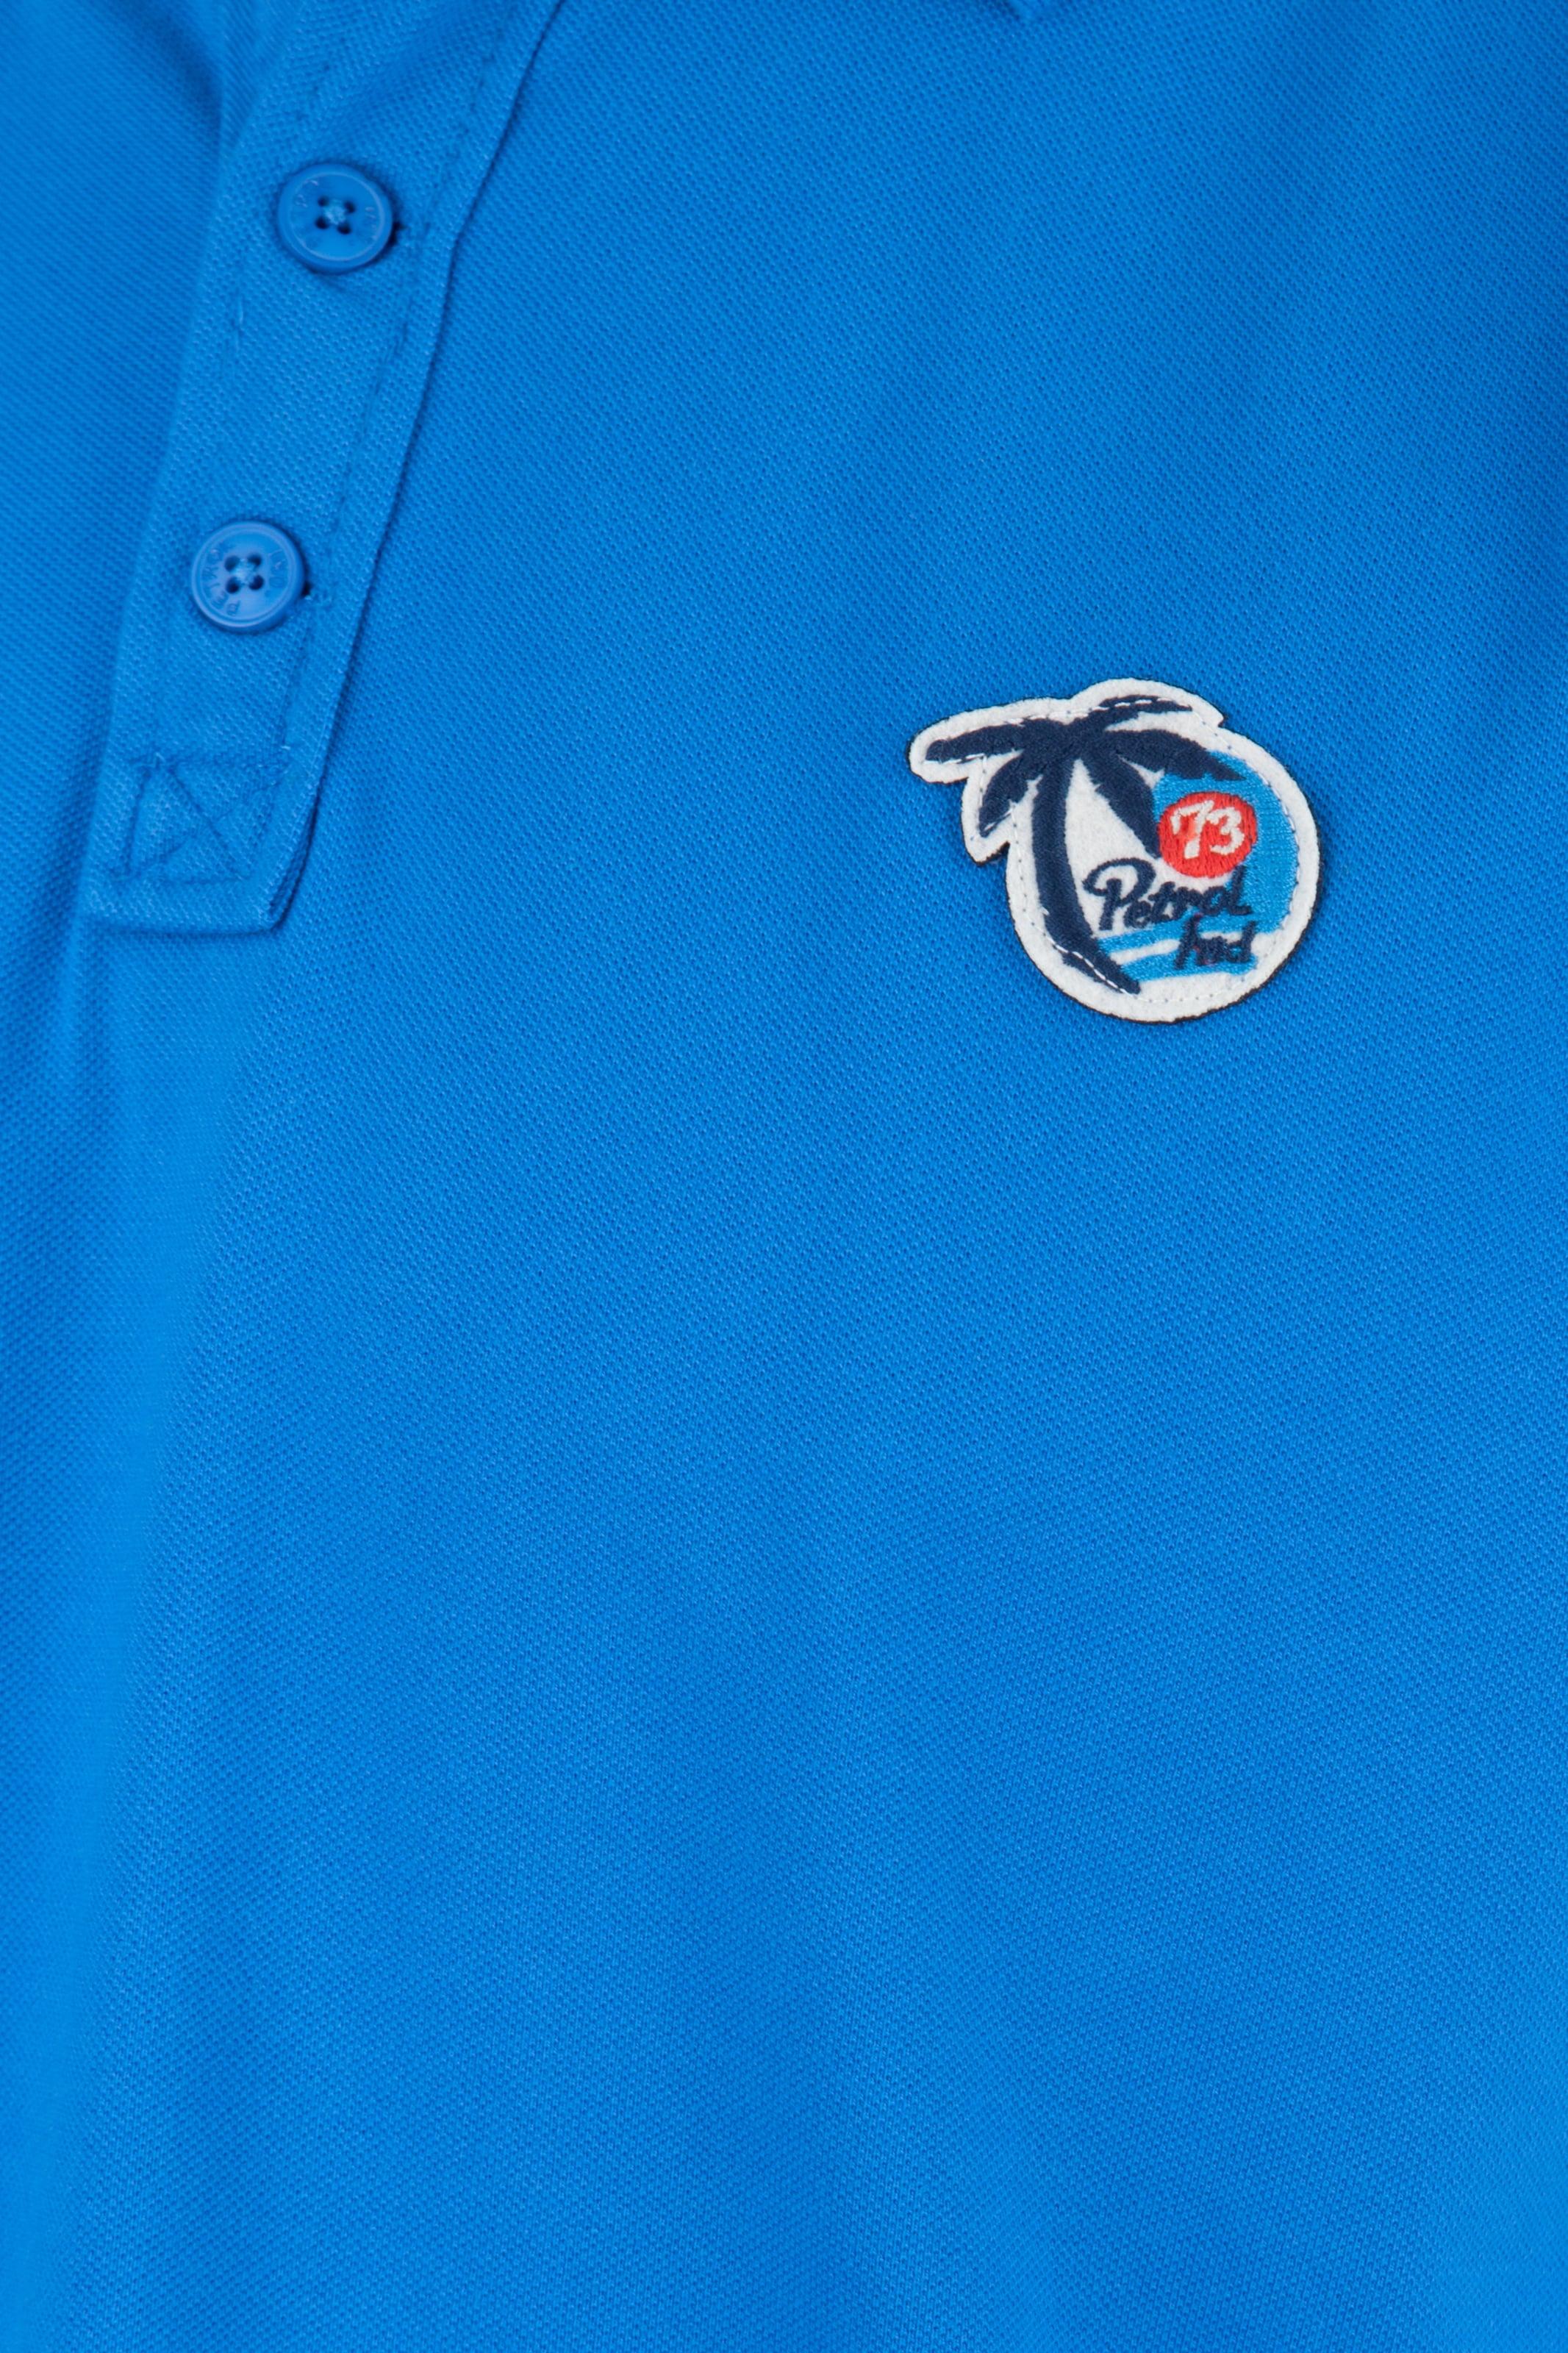 Petrol Industries Poloshirt Billig Verkauf Websites qDbCU6